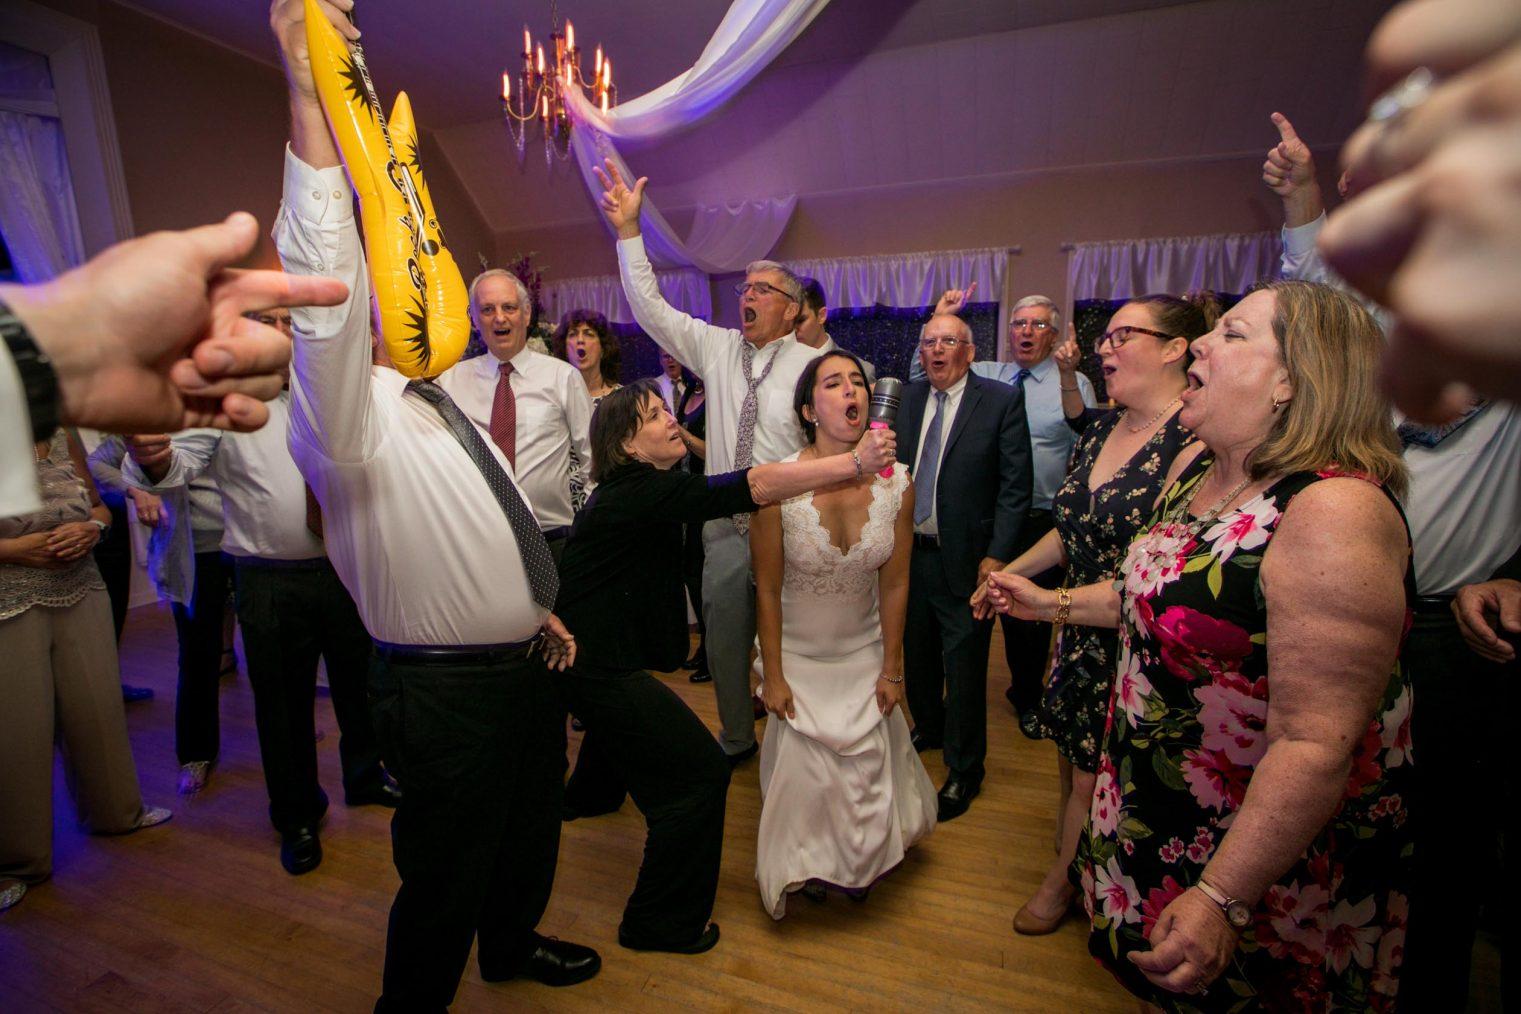 Crazy wedding party photos Kathryn Cooper Weddings